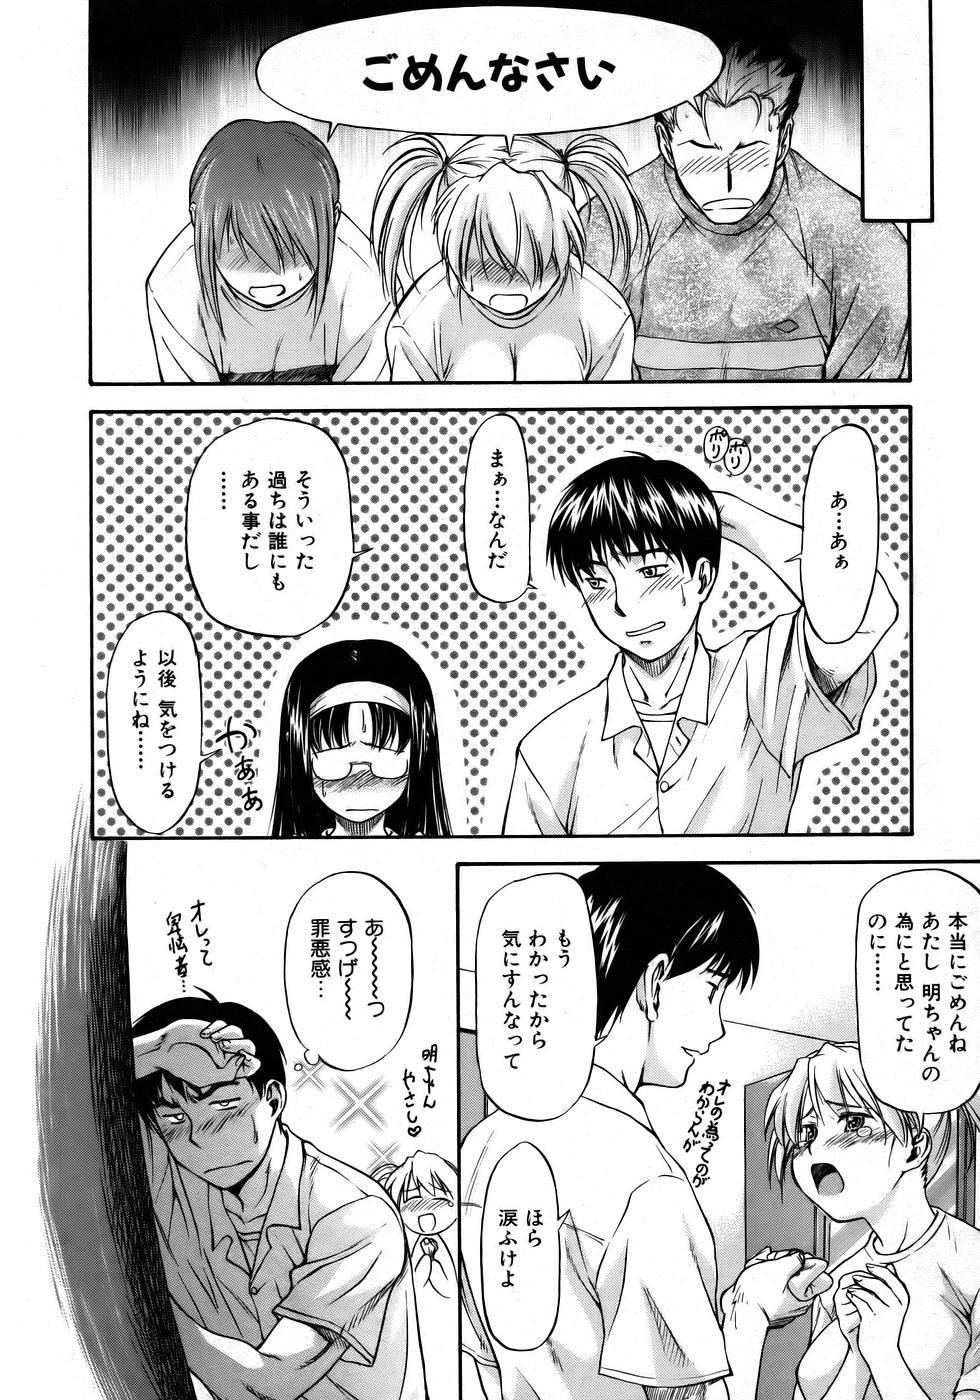 COMIC AUN 2005-12 Vol. 115 55